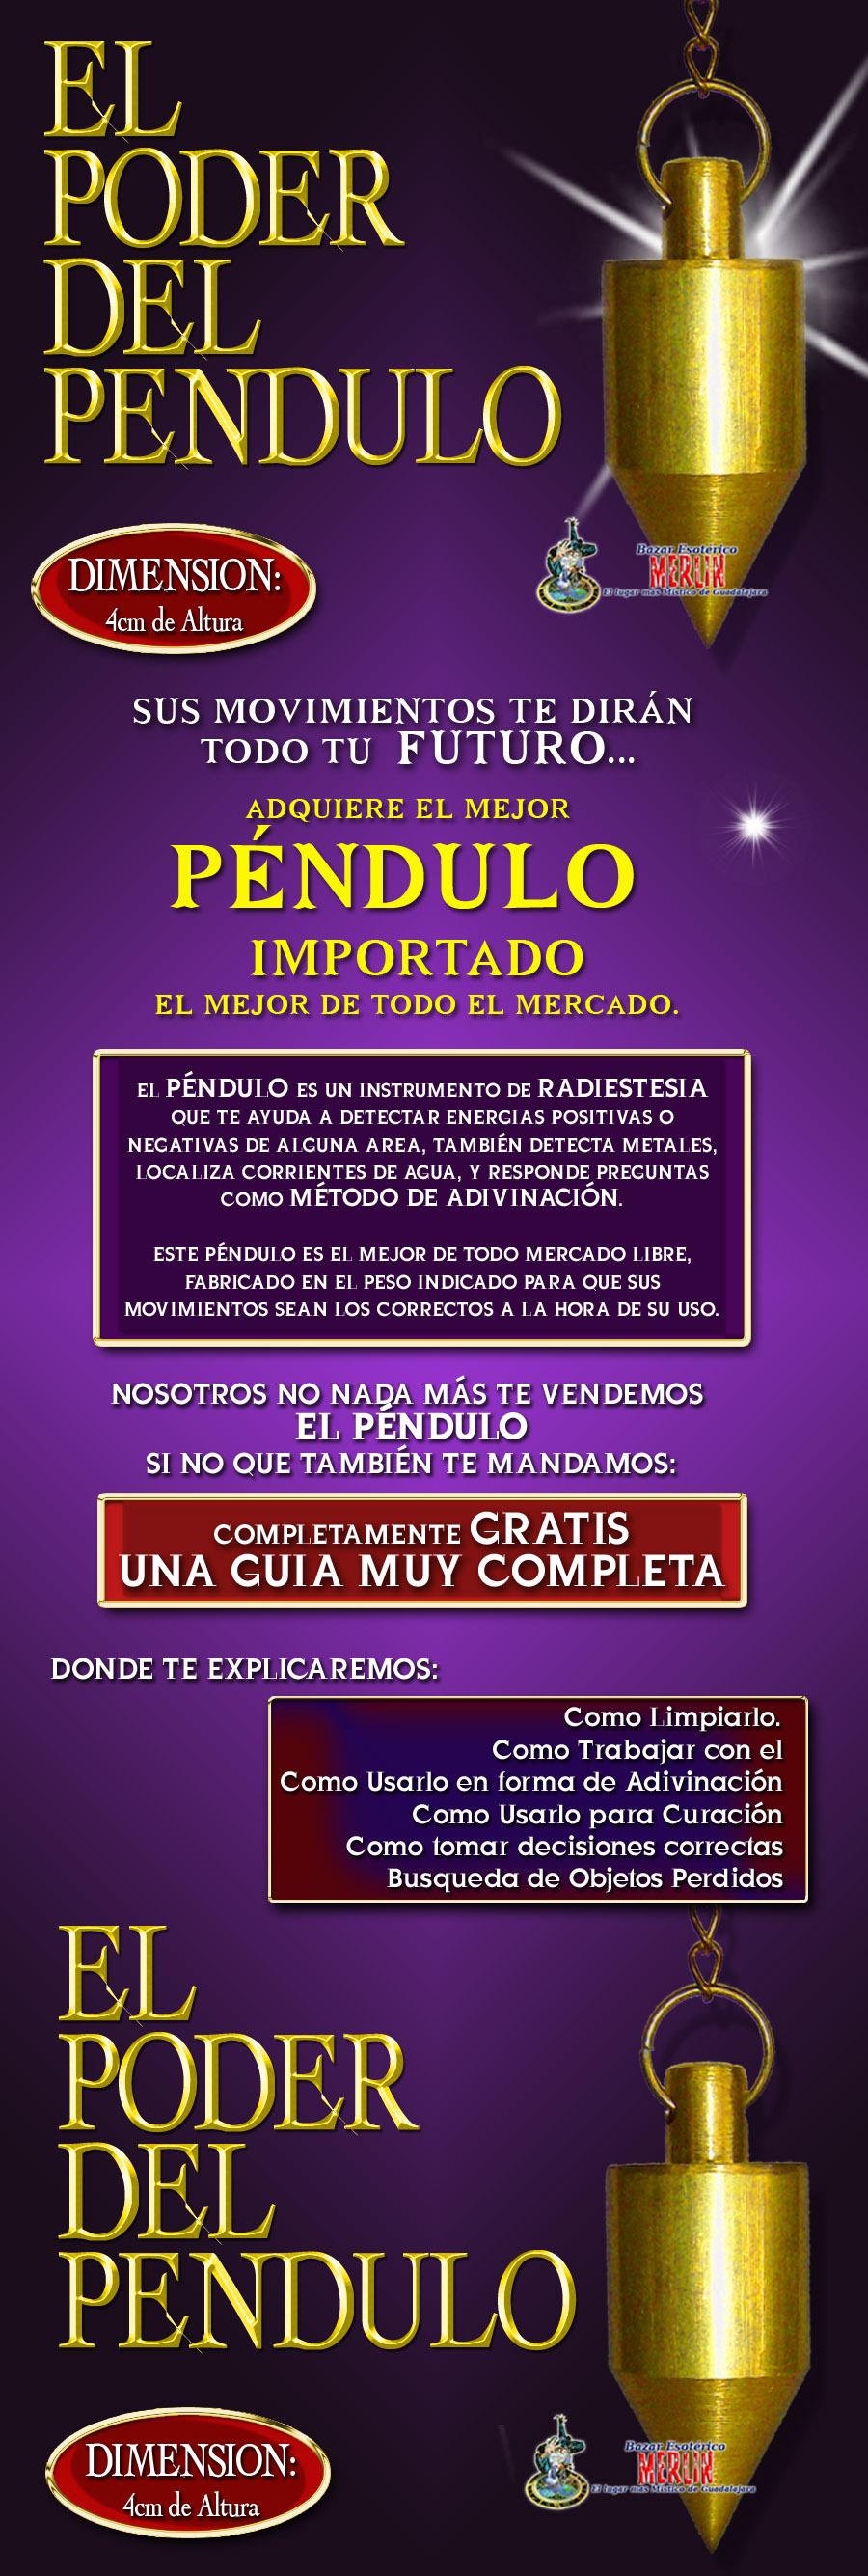 El-Poder-Del-Pendulo-Largo-Sin-Testigo-Diseno-01